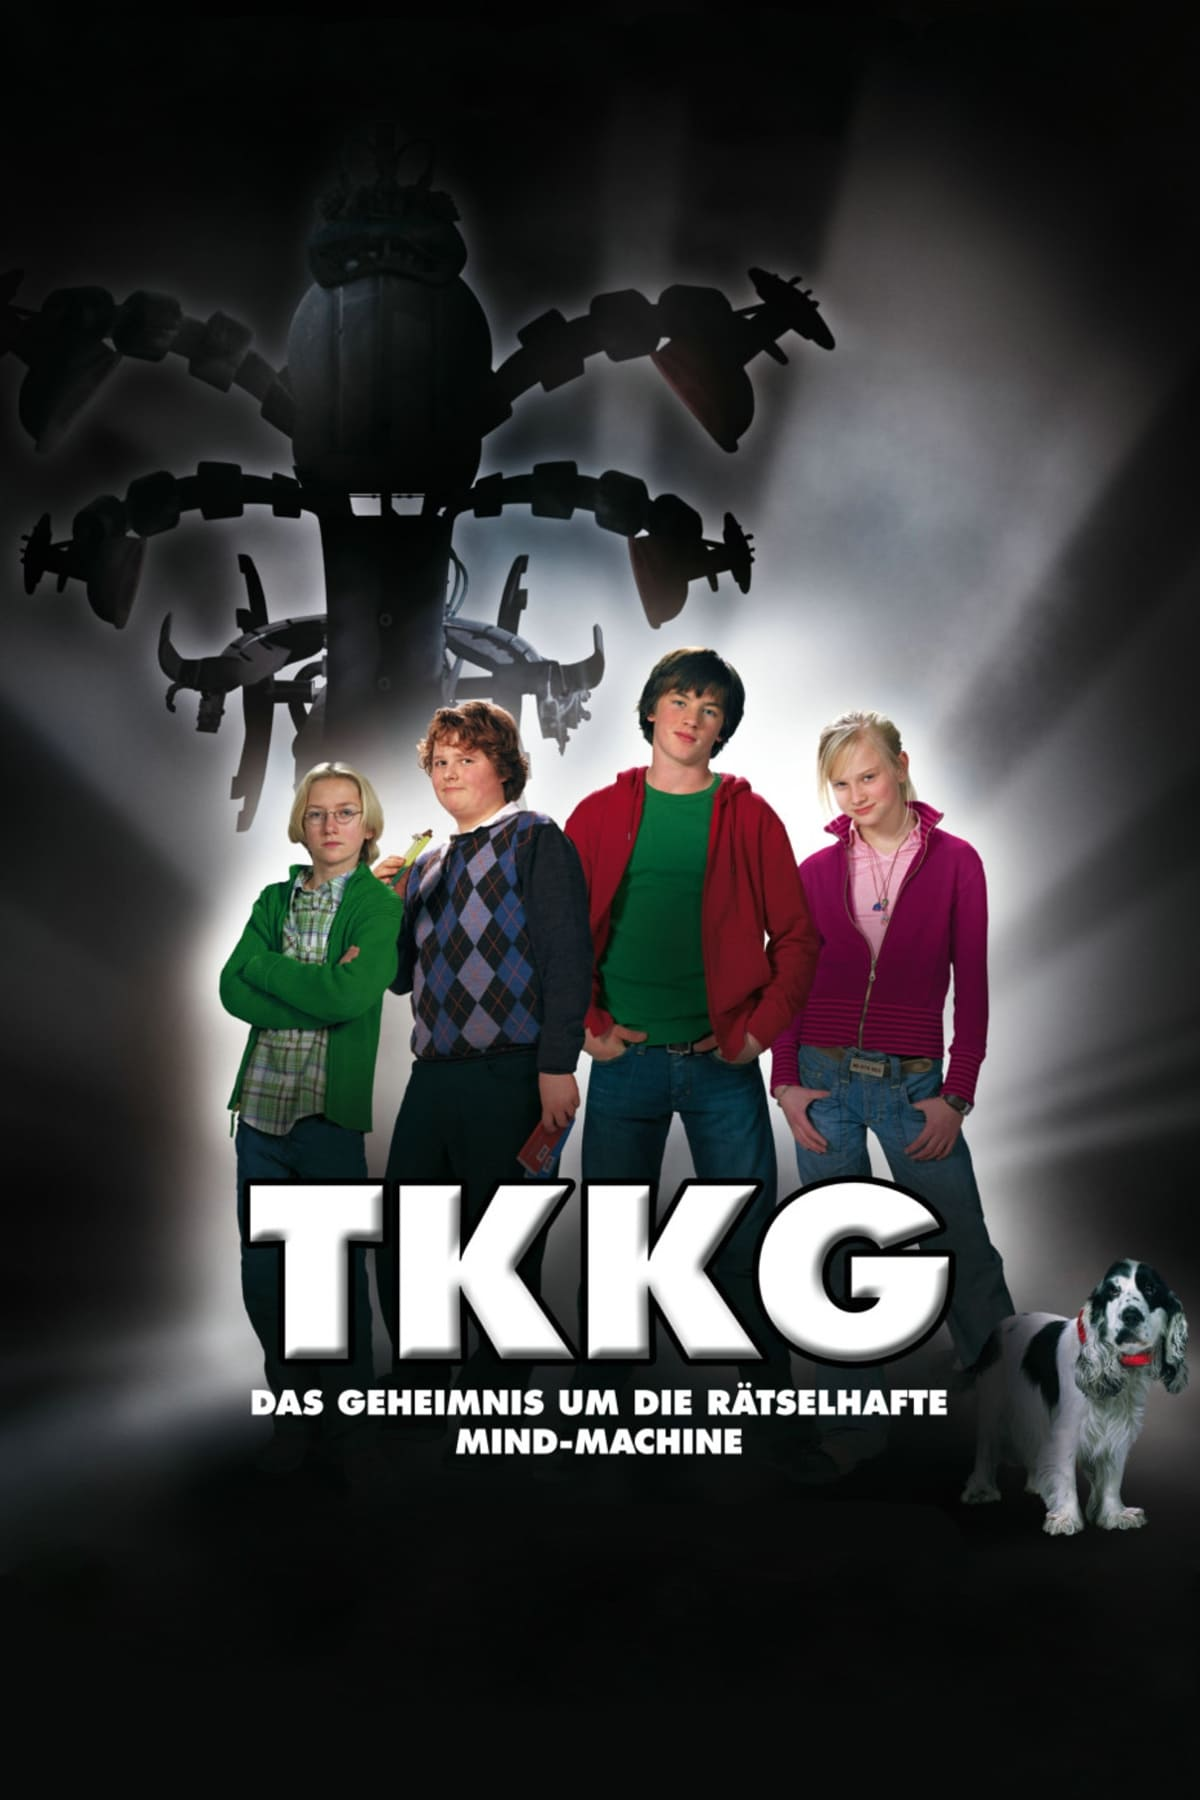 TKKG - The Secret of the Mysterious Mind Machine online